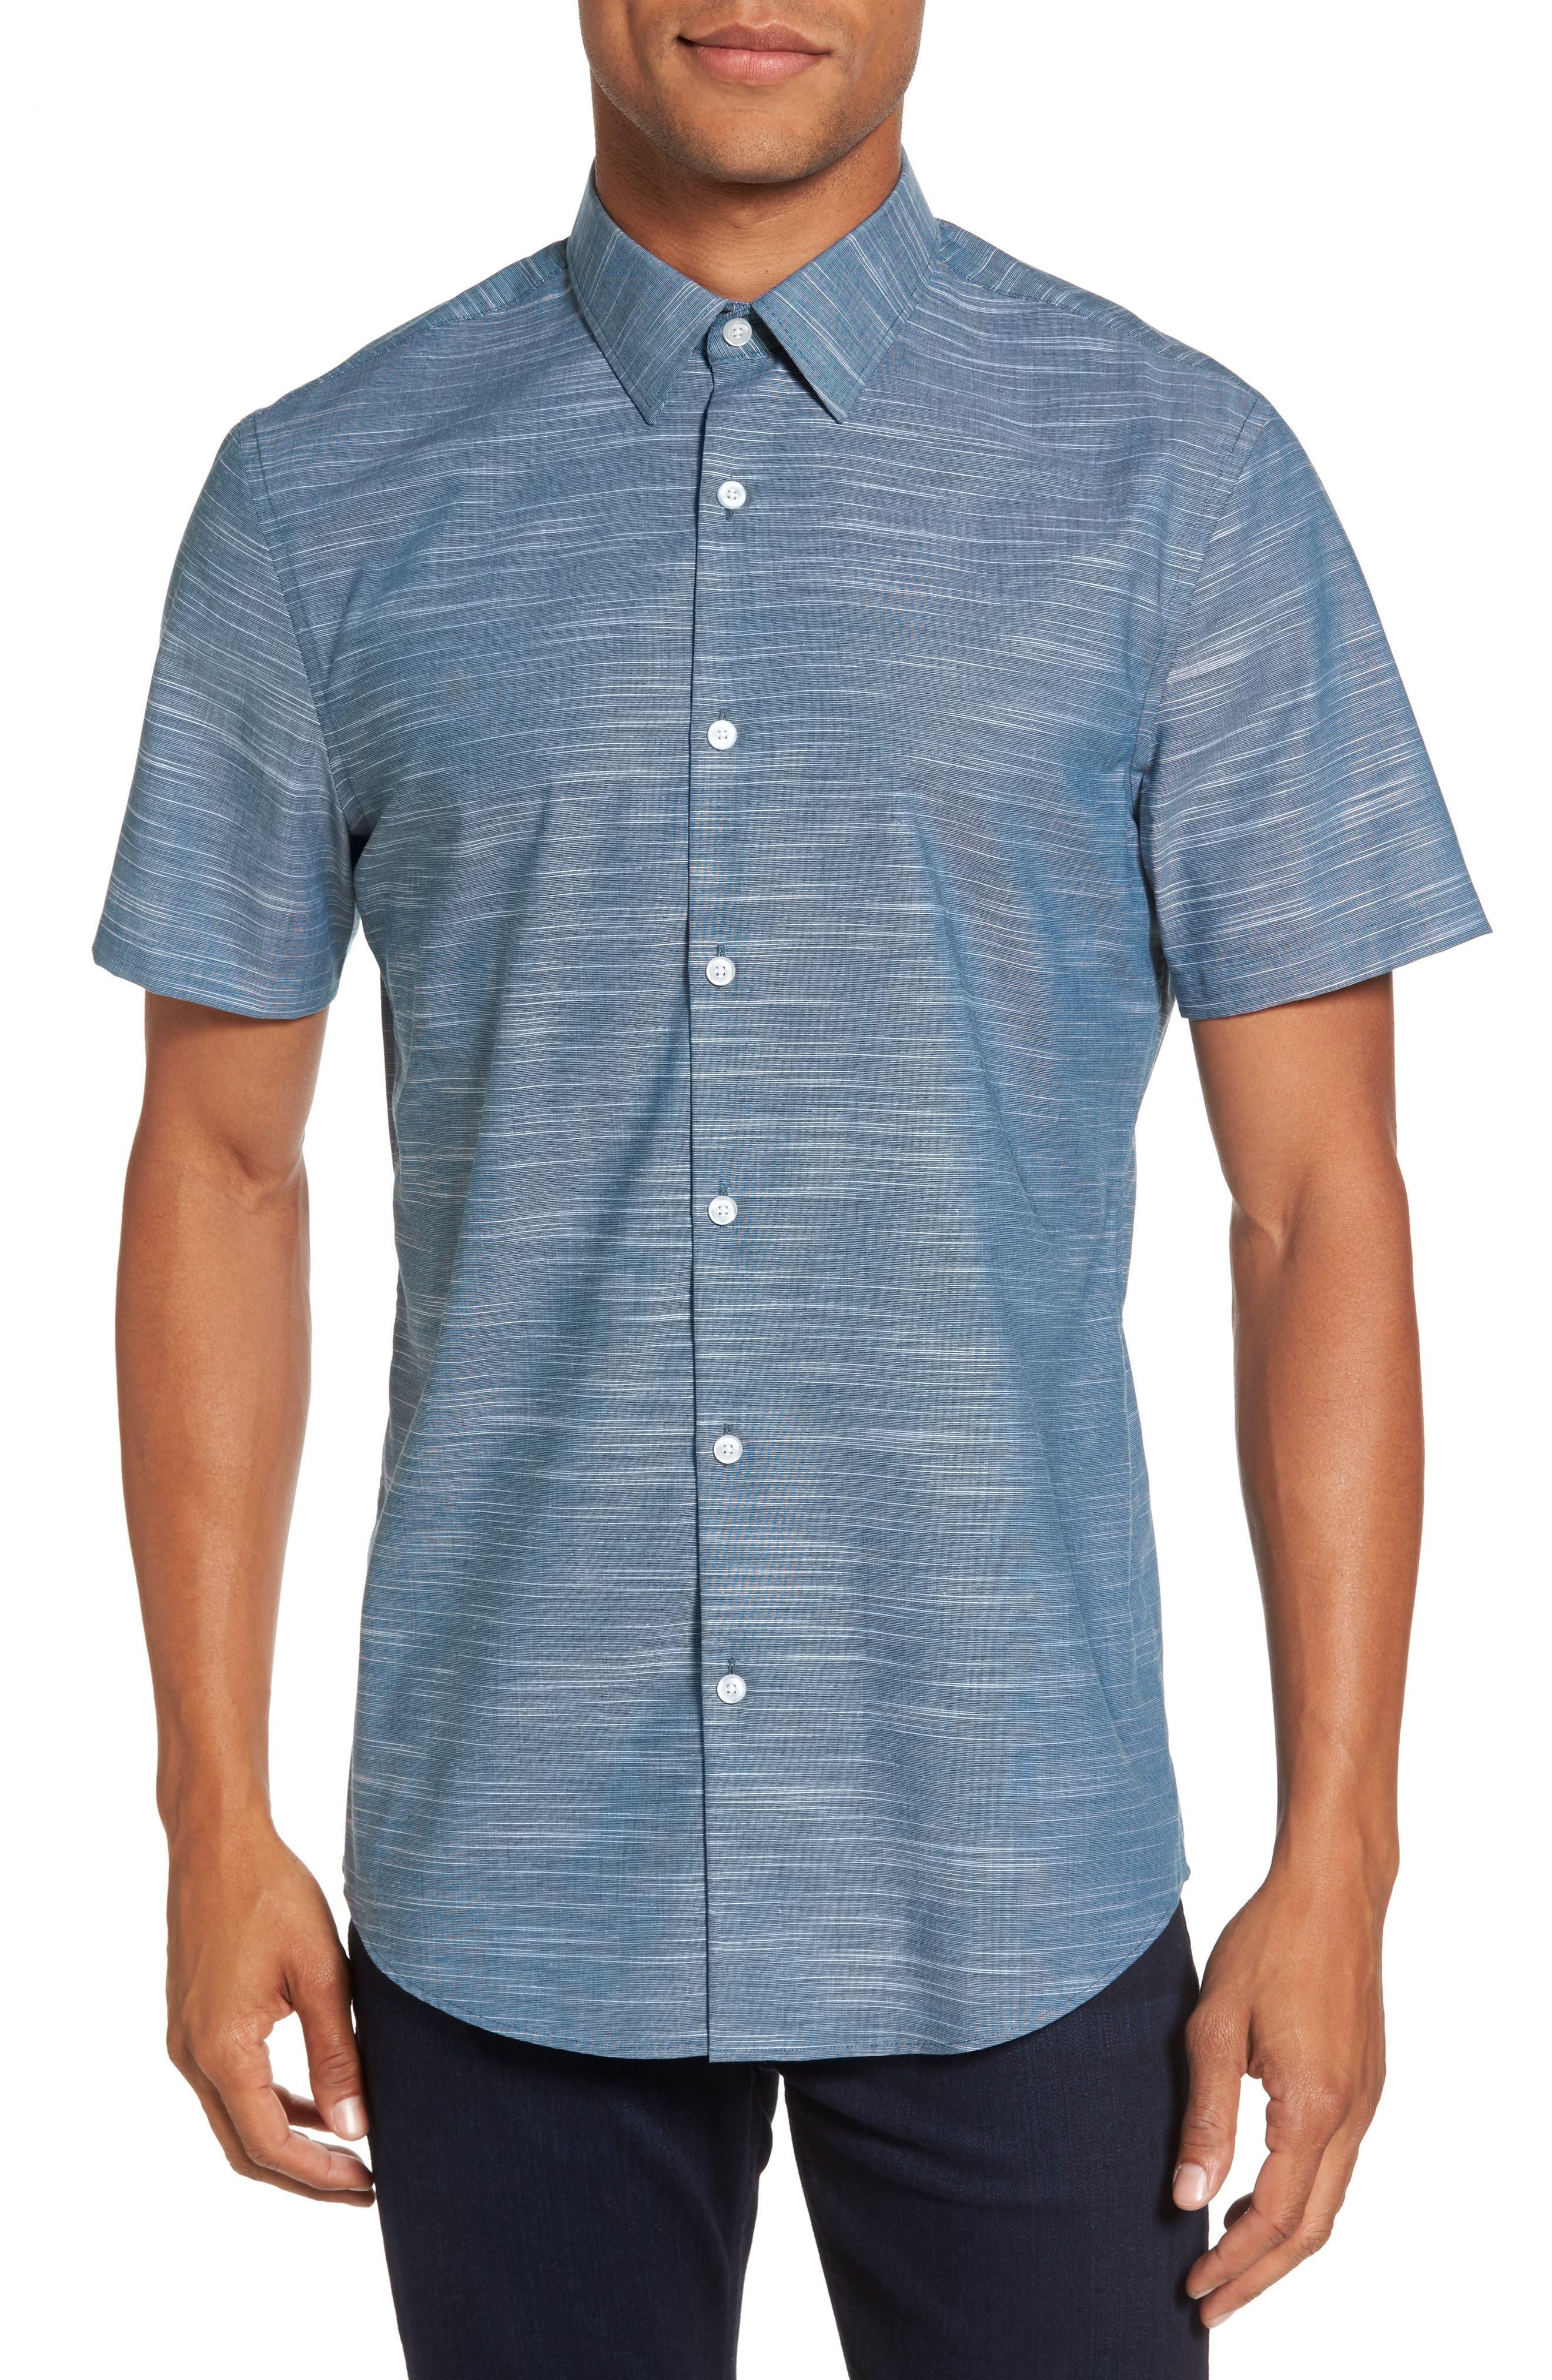 Calilbrate Slim Fit Slub Woven Shirt,                         Main,                         color,